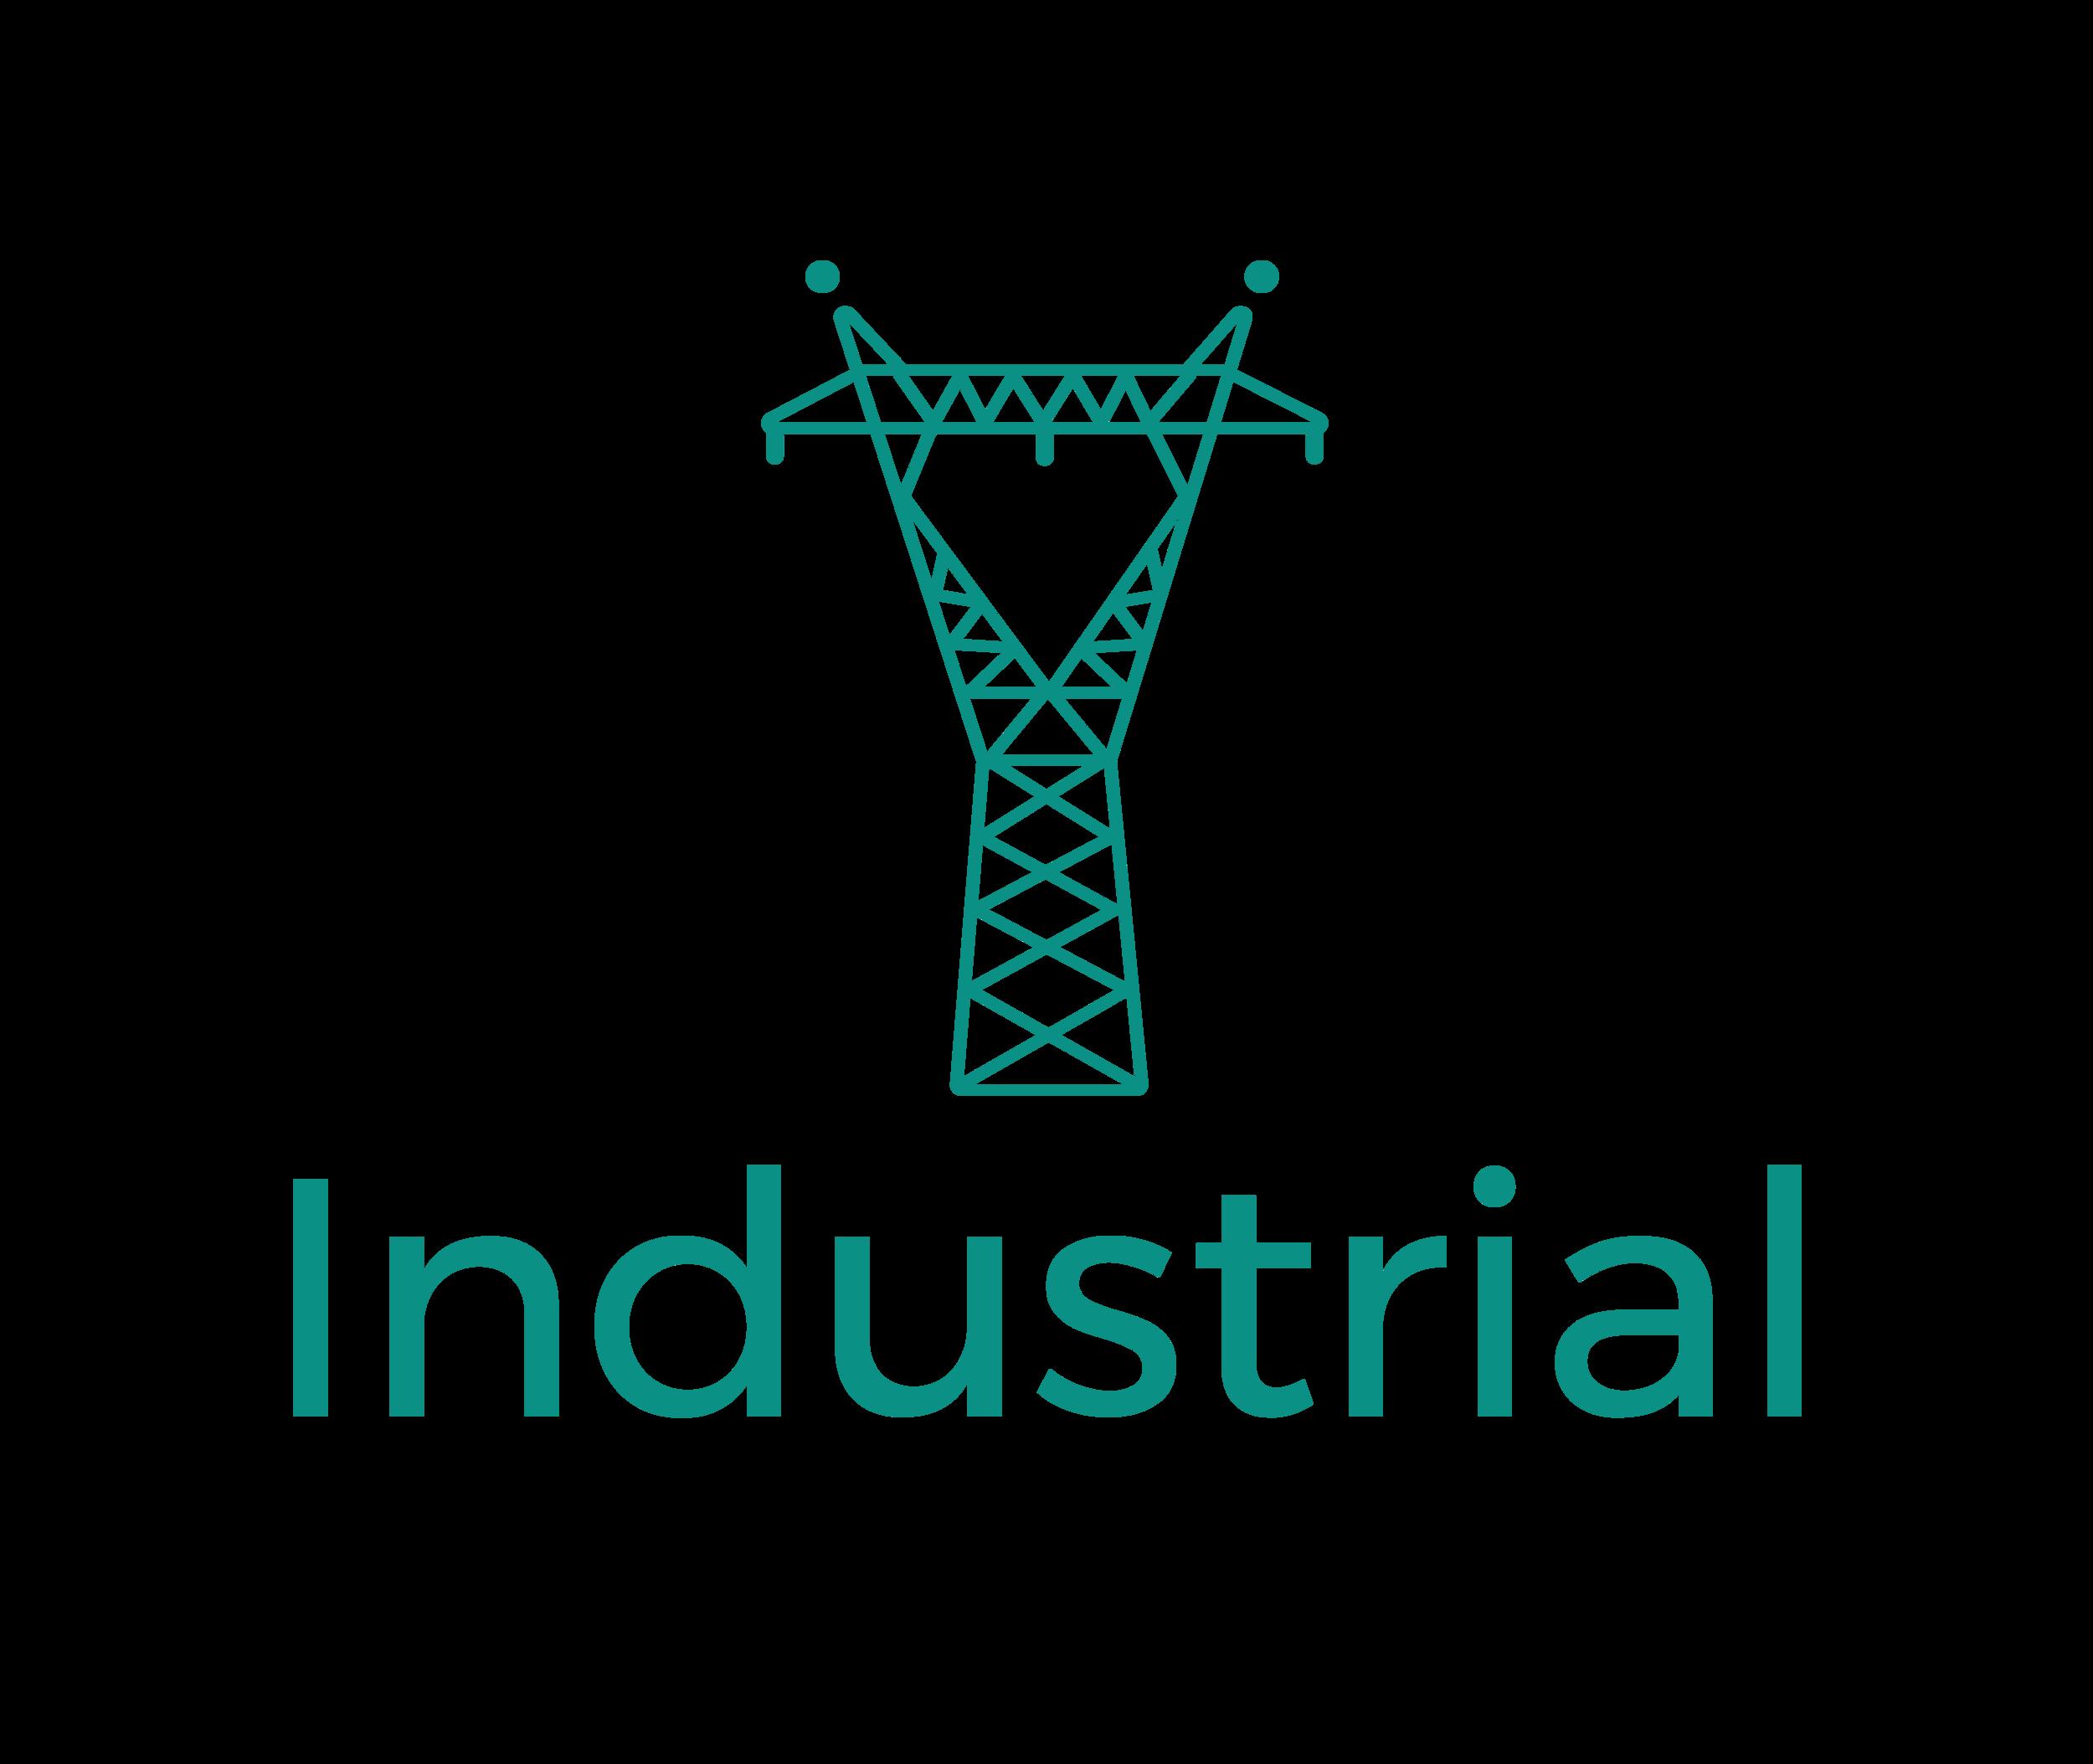 Industrial-logo.png